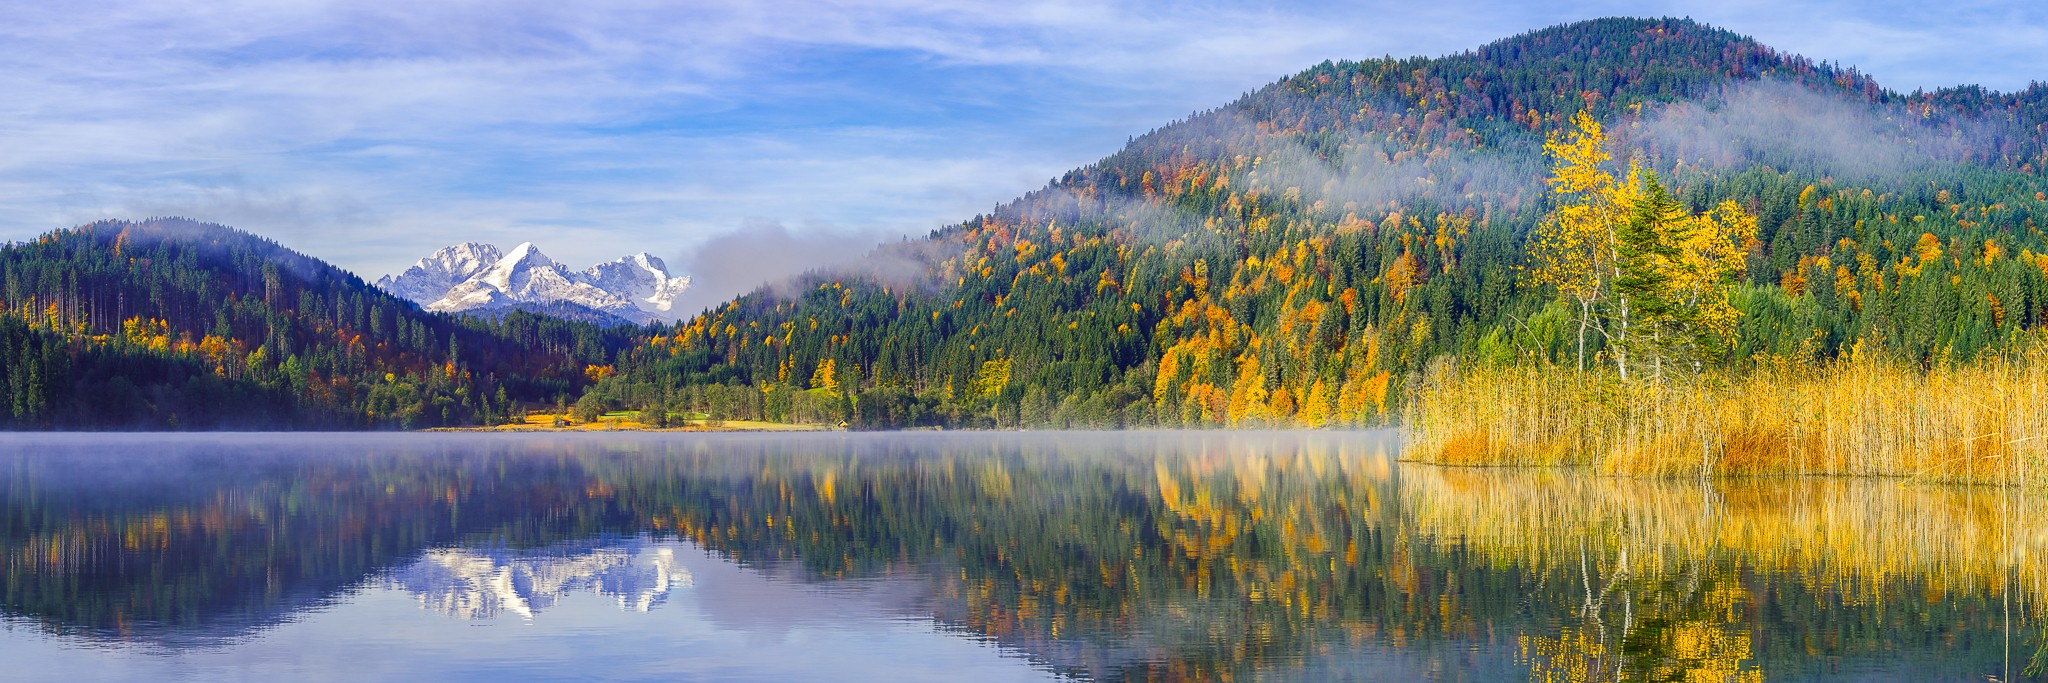 Barmsee-Herbst-Farbenpracht